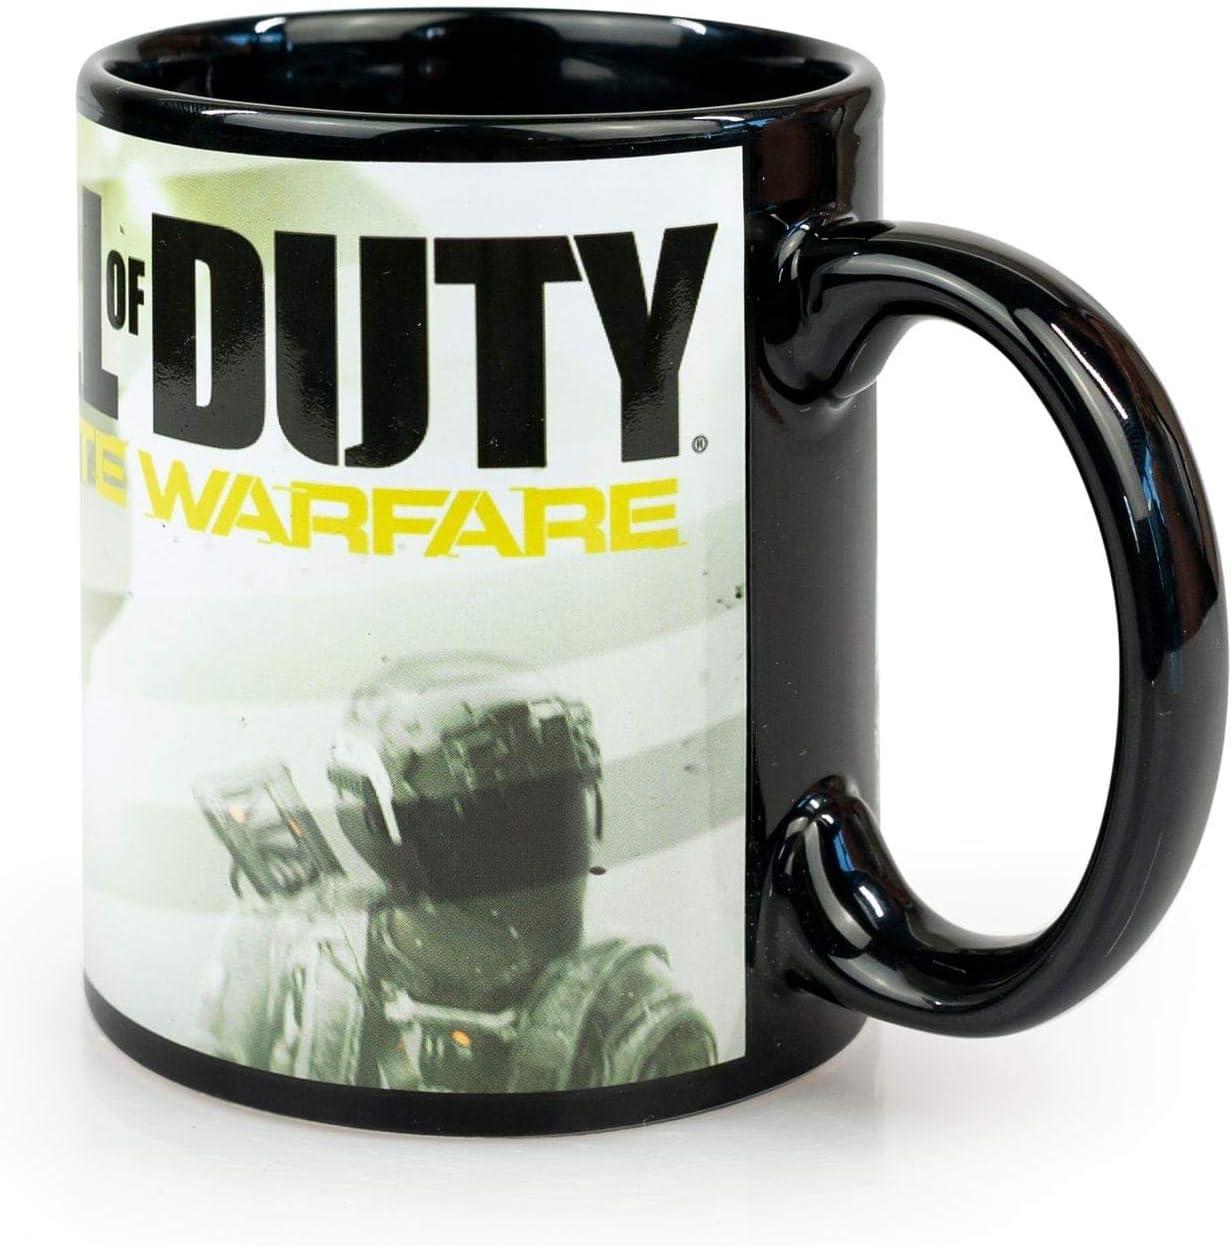 Call of Duty Costume | Call of Duty Infinite Warfare Ceramic Heat Reactive Mug